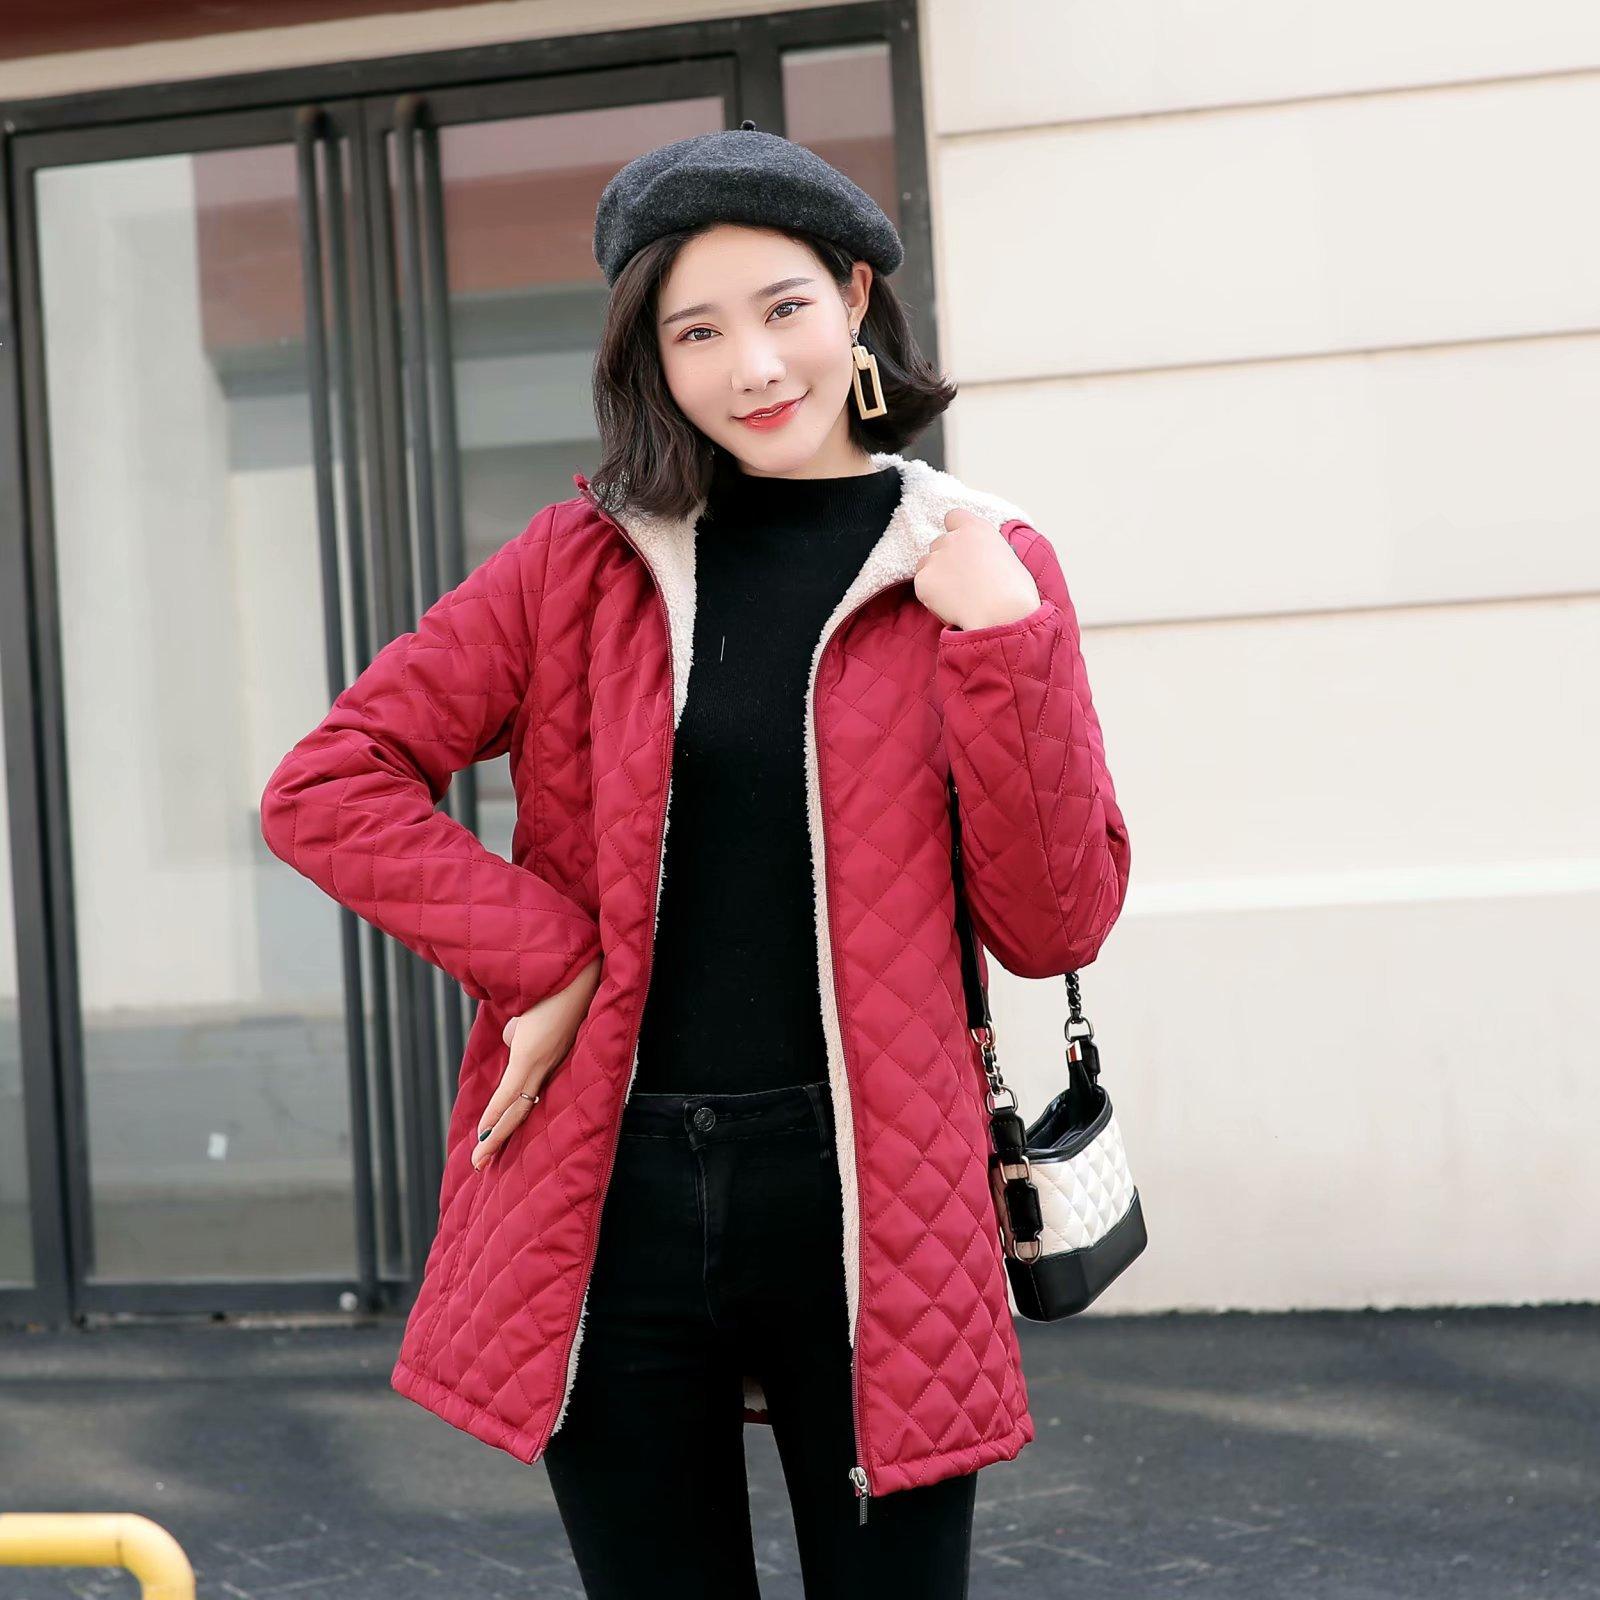 Autumn 2019 Long   Parkas   Basic Jackets Female Women Winter Plus Velvet Lamb Hooded Coats Cotton Winter Jacket Womens Outwear Coat